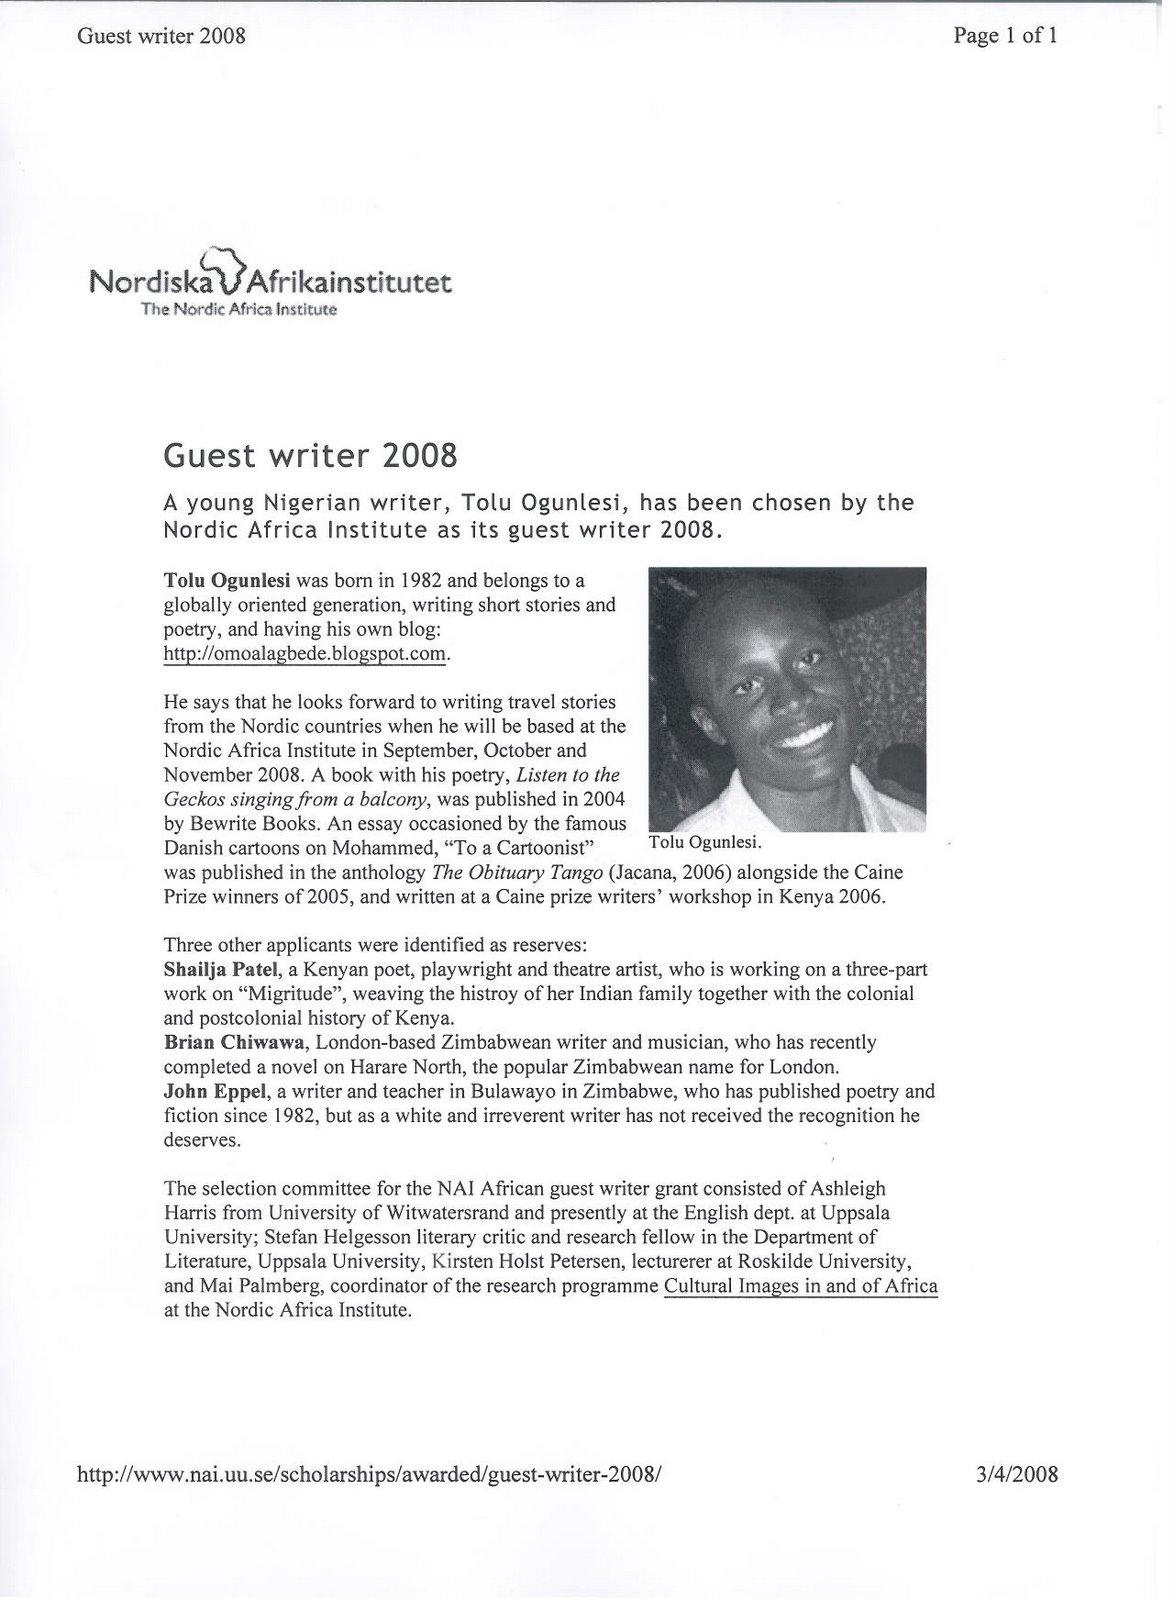 [NAI+Guest+Writer+2008]